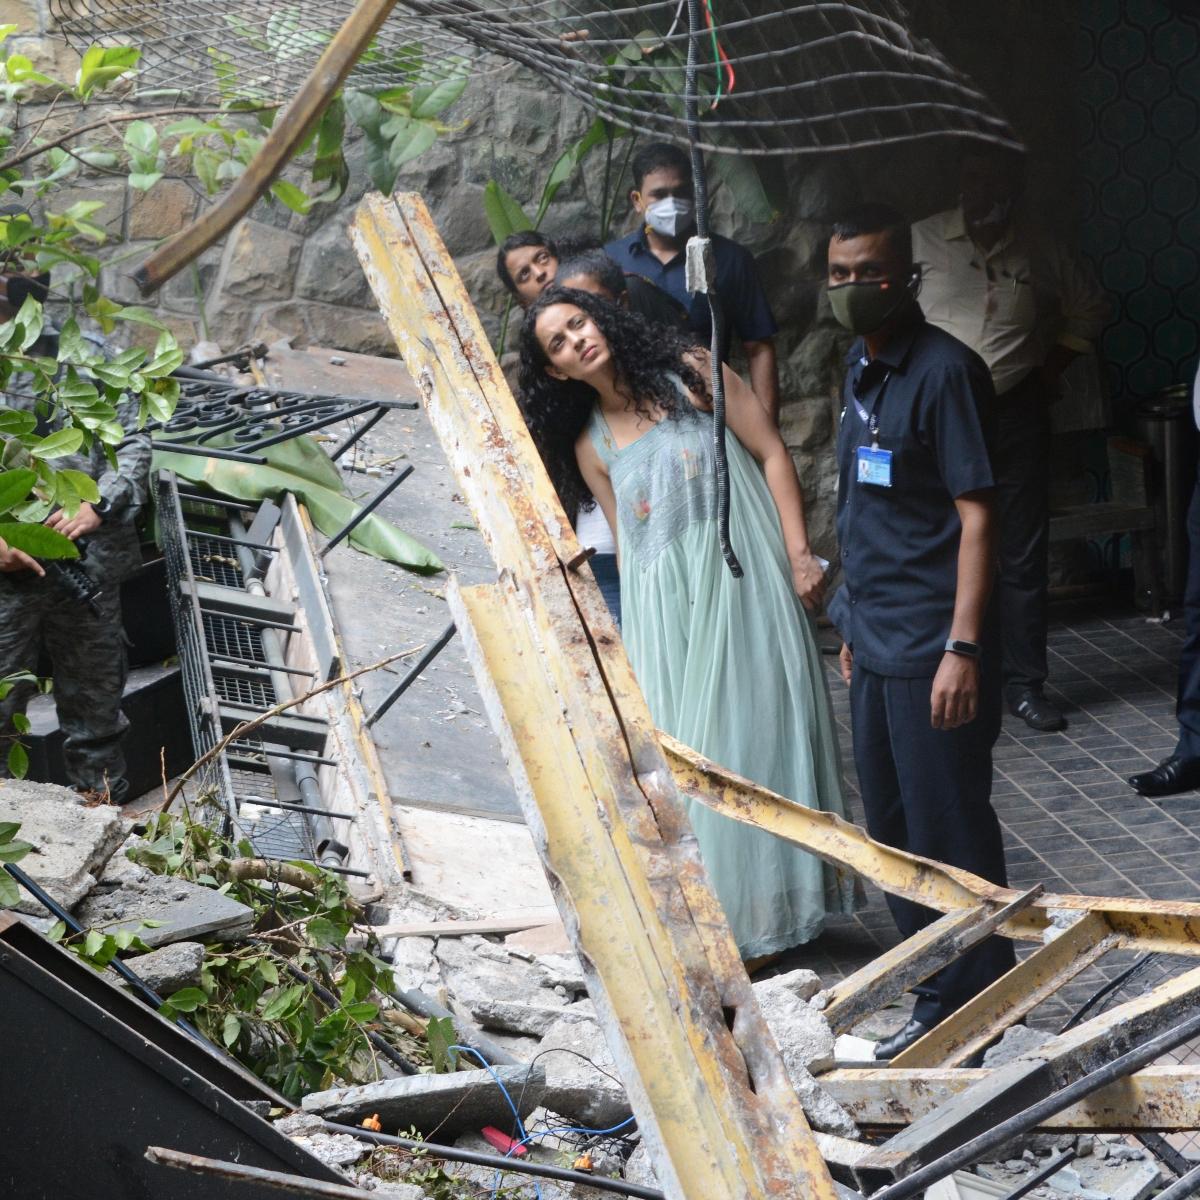 'Mafia bimbo comparing me to small-time druggie': Kangana lashes out at Sonam and Rhea